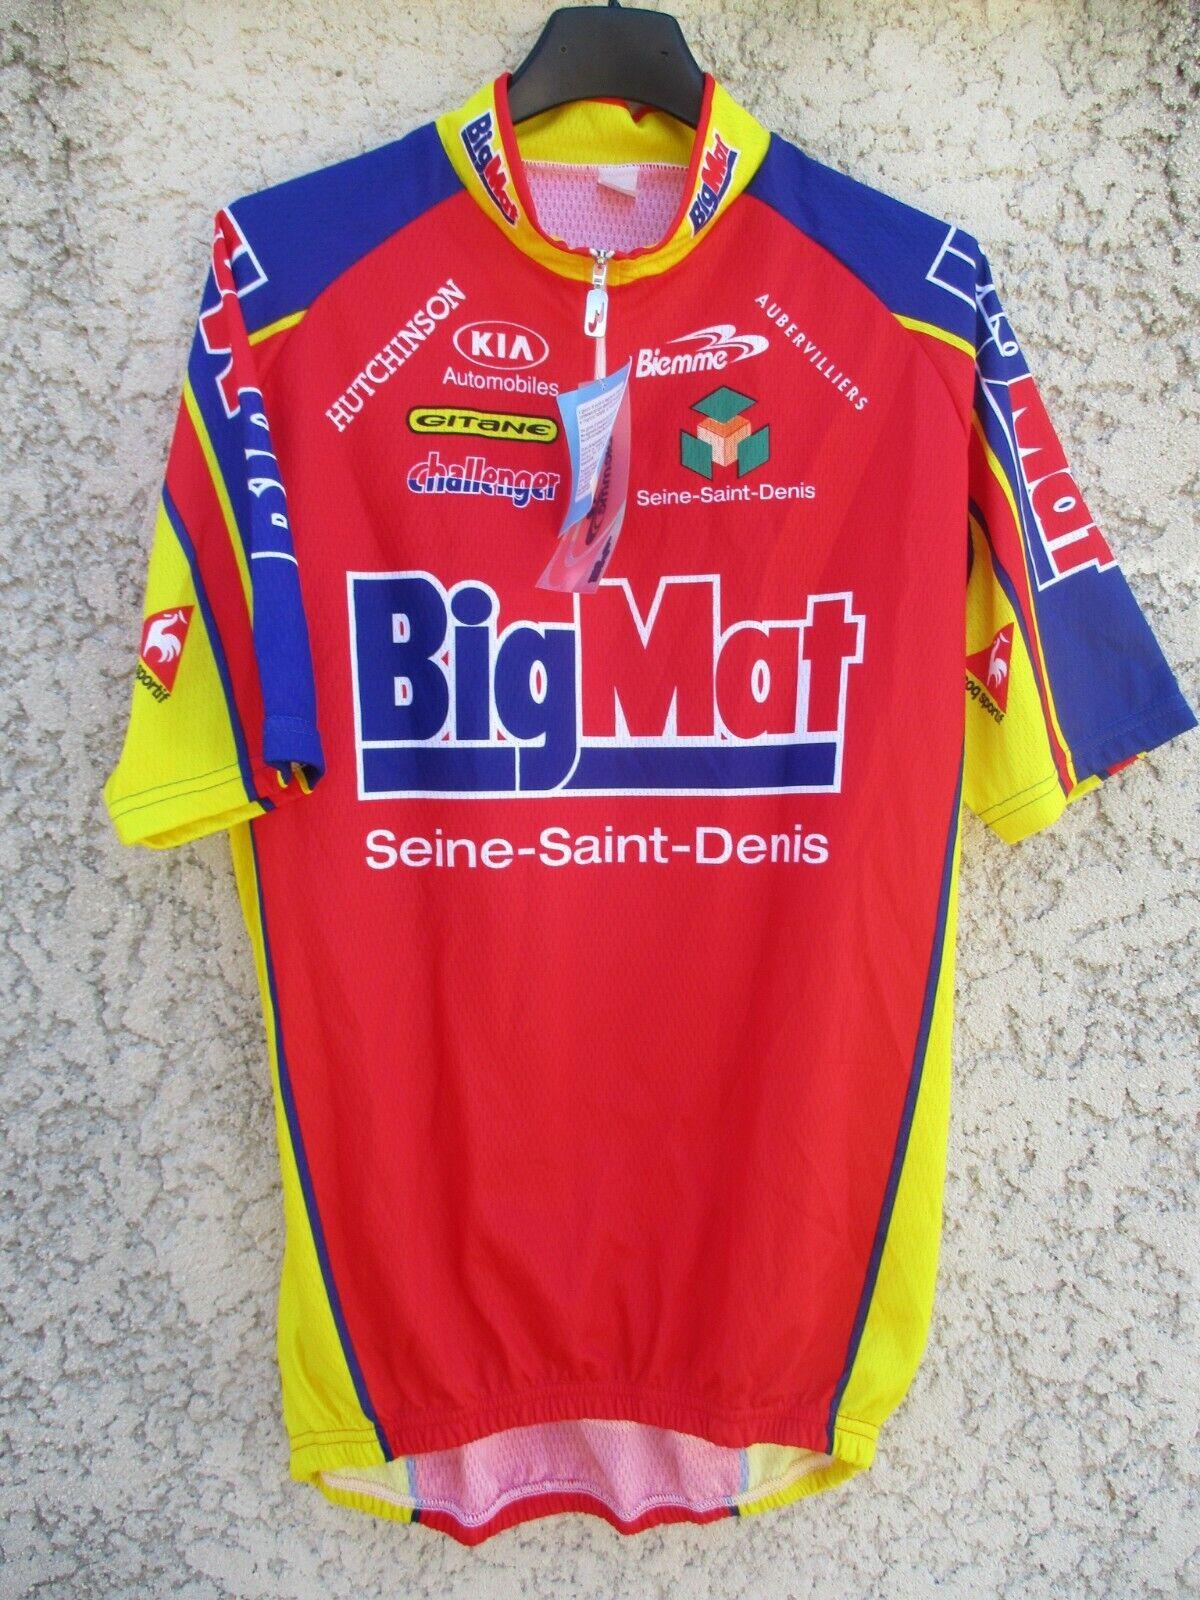 Maillot cycliste  BIGMAT AUBER 93 2002 BIEMME cycling shirt trikot maglia NEUF XL  nueva marca